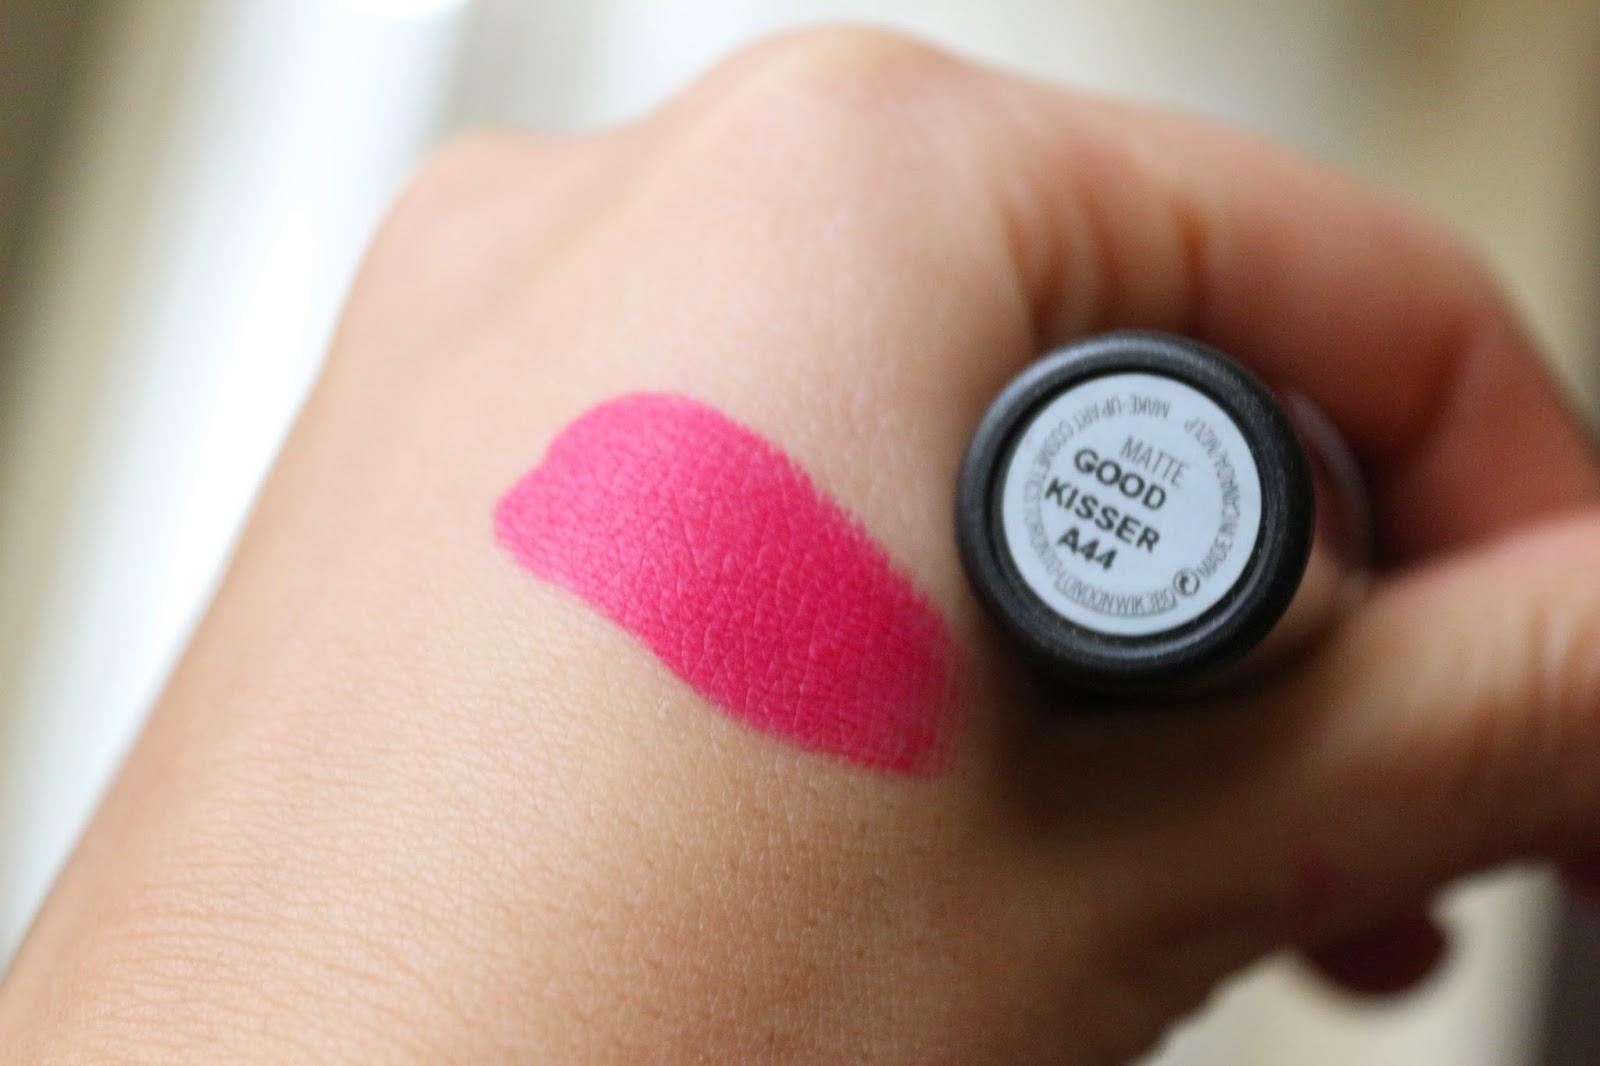 elca kozmetik mac bobbi brown lipstick goodkisser